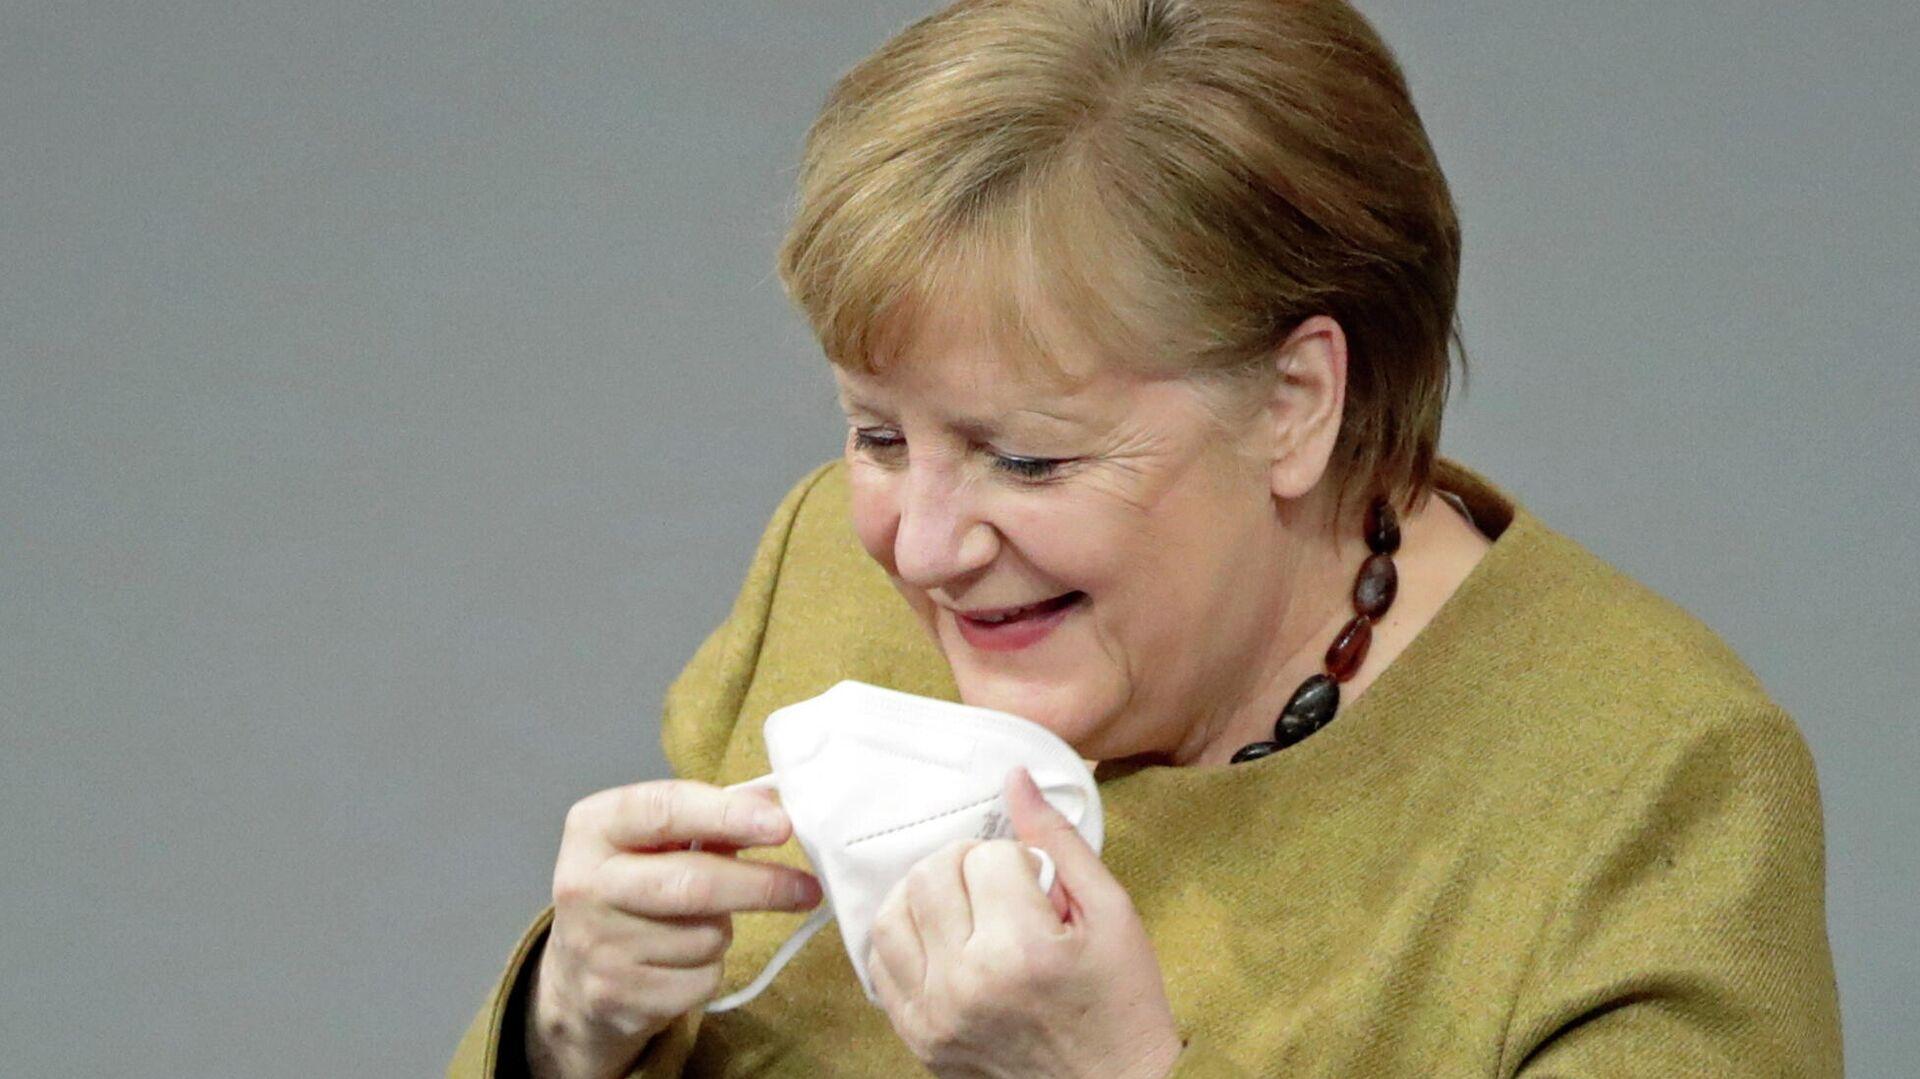 Angela Merkel, canciller alemana - Sputnik Mundo, 1920, 18.02.2021